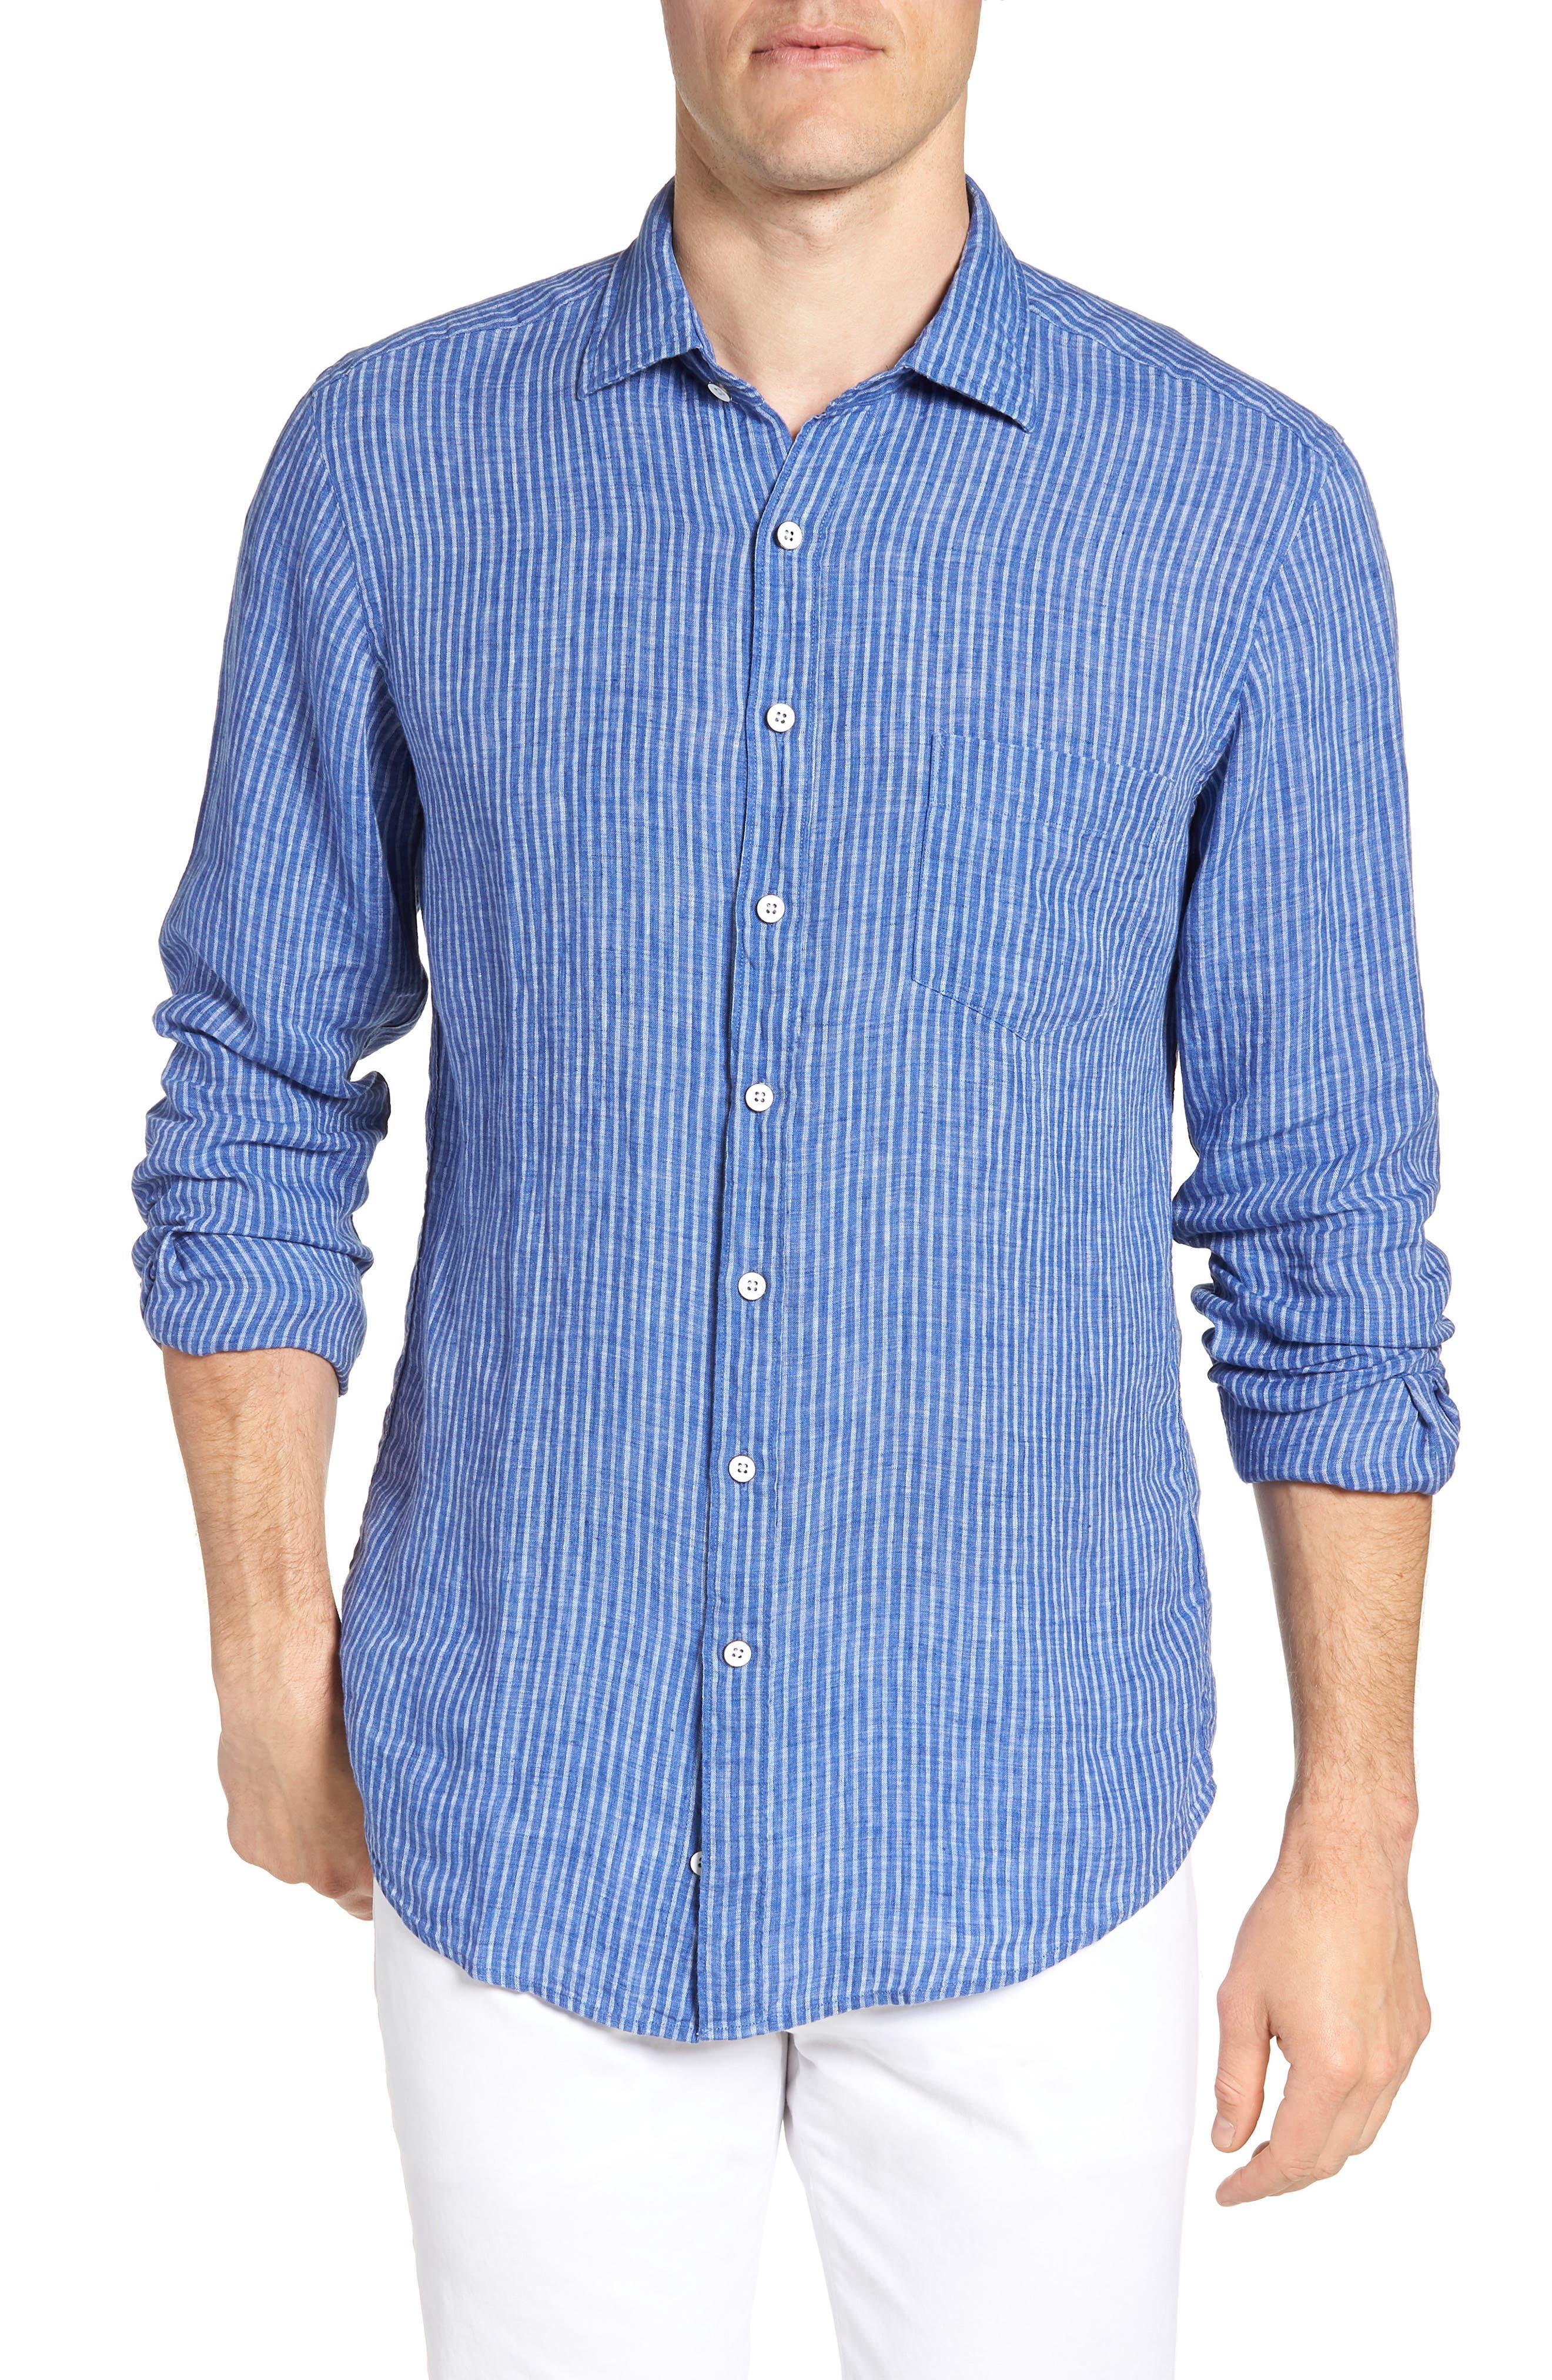 Warwick Junction Stripe Linen Sport Shirt,                             Main thumbnail 1, color,                             ULTRAMARINE